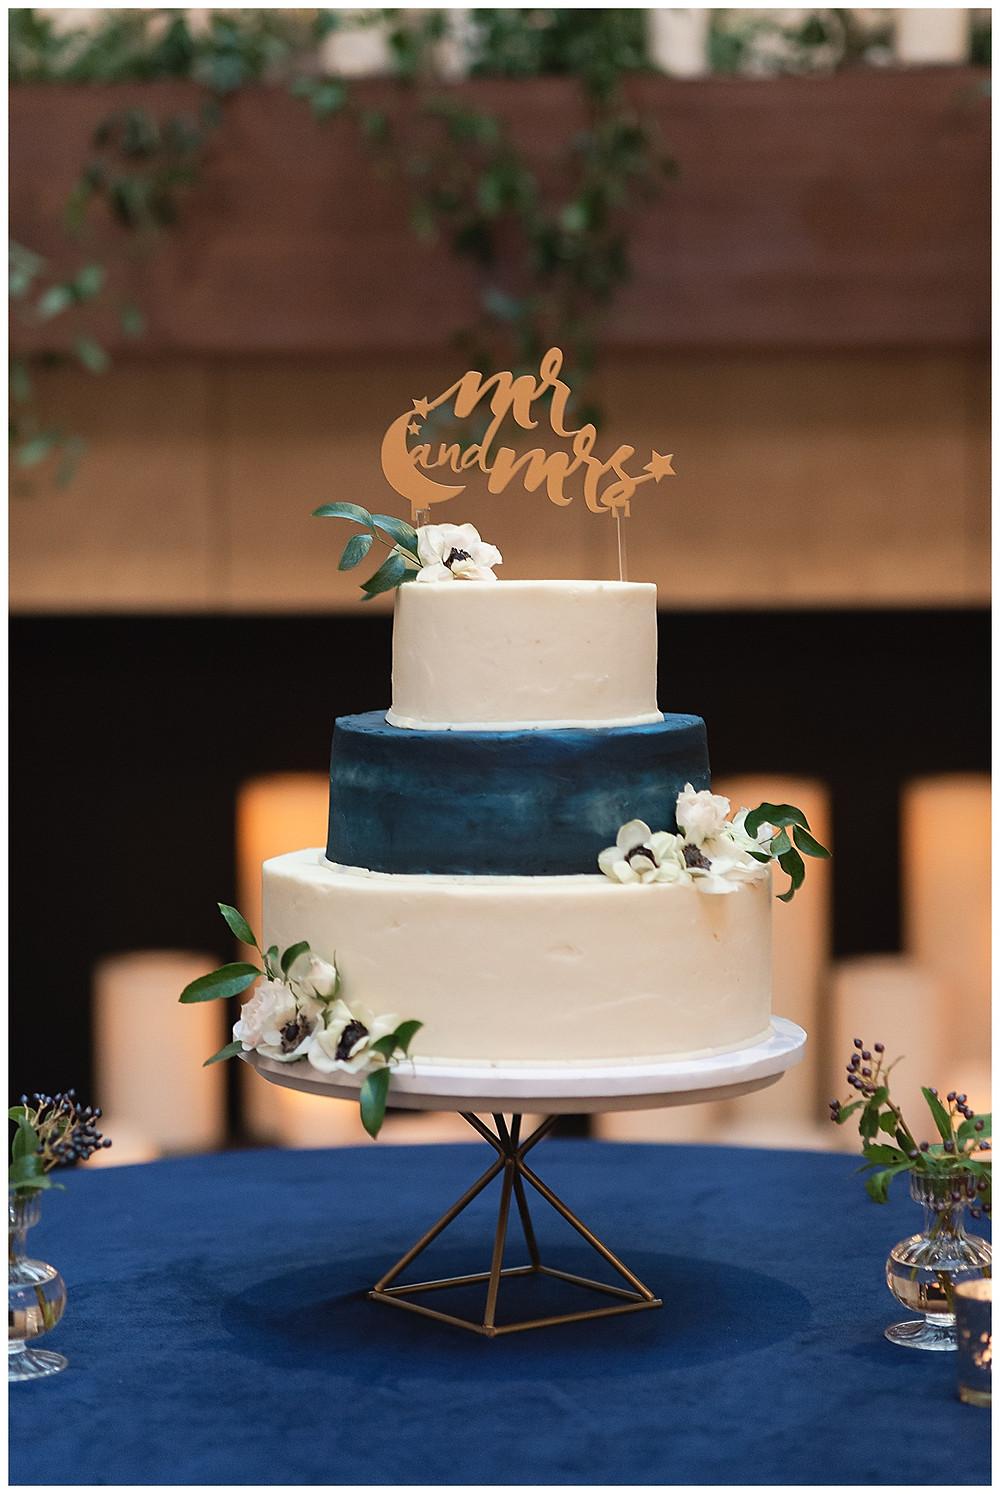 Chapel Ana Villa, The colony Texas, dallas wedding, dallas wedding photography, dallas wedding venue ,  blue velvet table linen, cake table, three tier white, blue wedding cake, geo cake stand